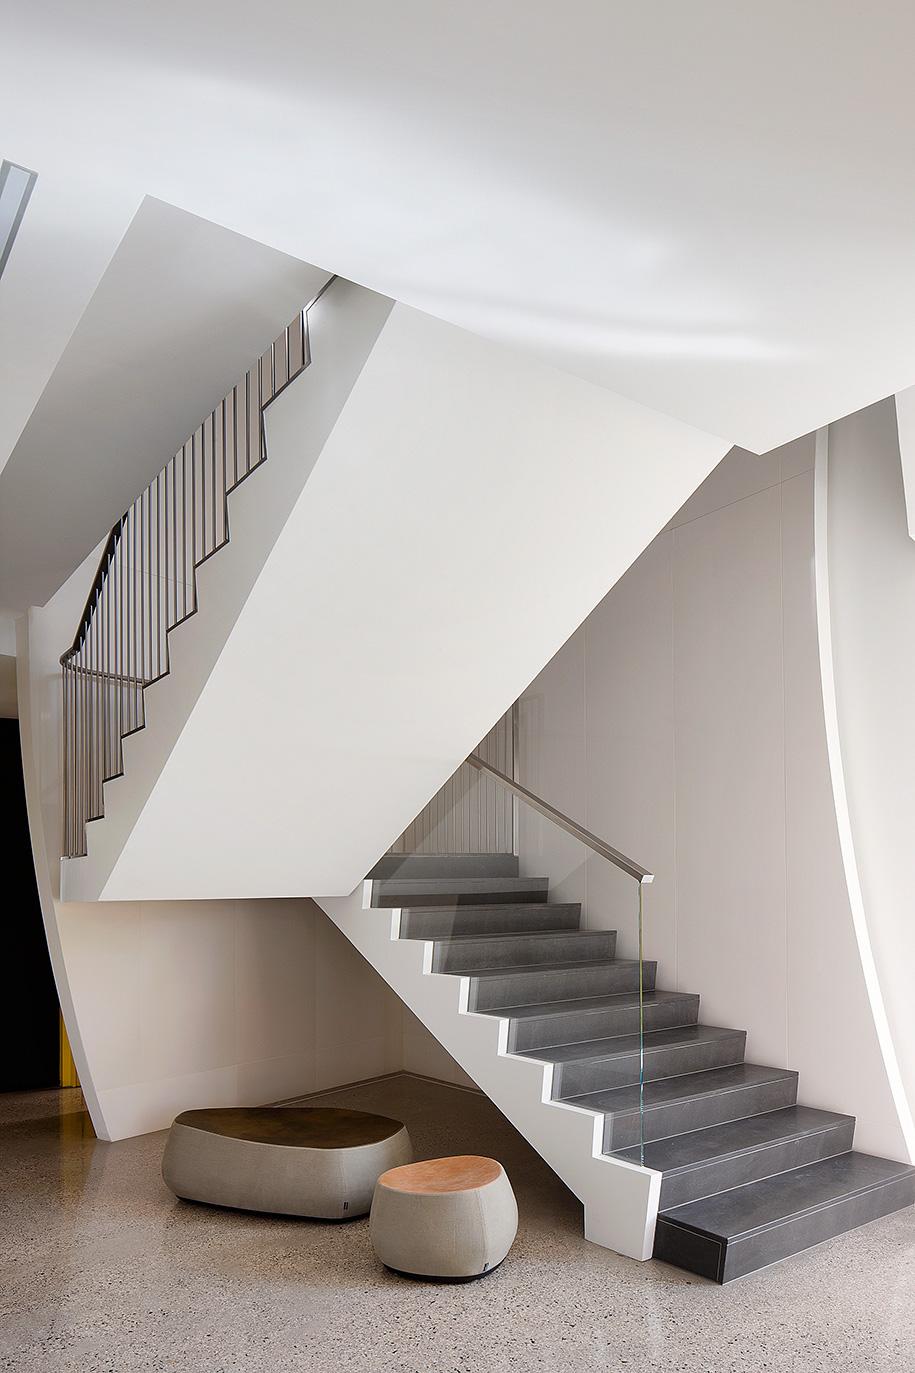 Field House Robert Puksand staircase